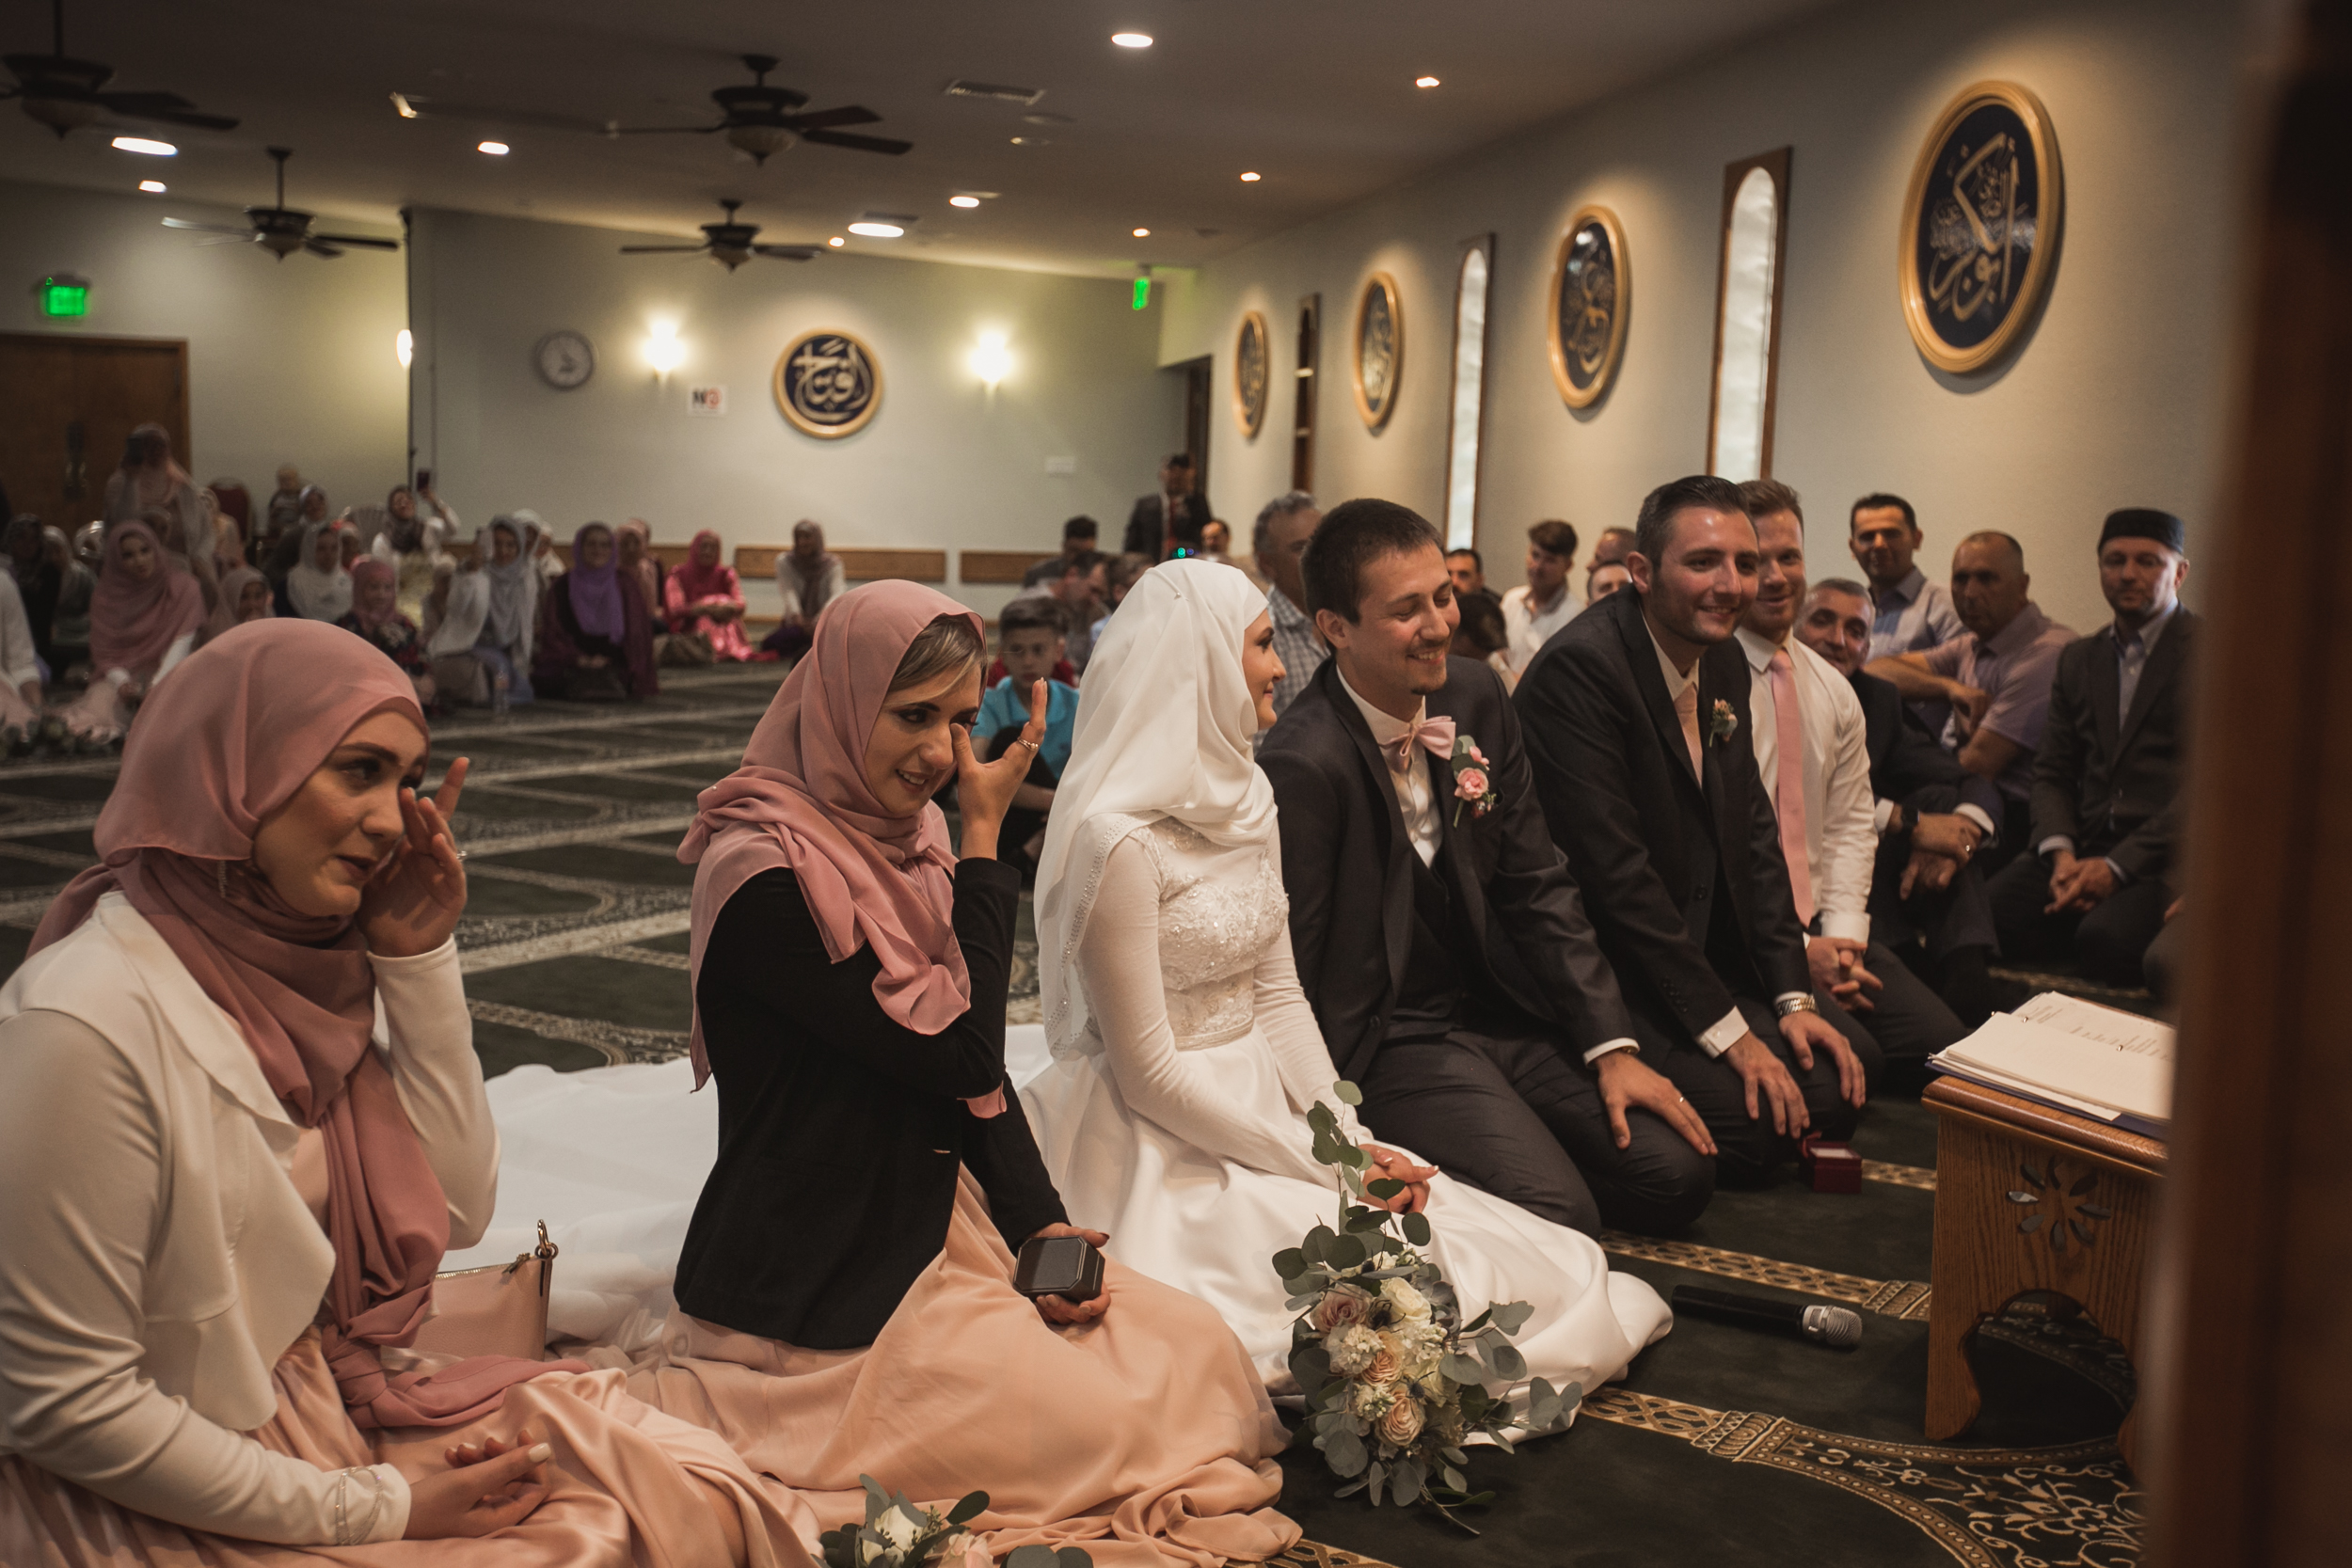 American Royal Palace Arizona wedding*, American Royal Palace Phoenix Wedding*, AZ Wedding*, Bosnian Phoenix*, Islamic Center of North Phoenix Muslim Wedding Photography*, Muslim Arizona Wedding*, Muslim Temple Wedding*, -www.rachelsmak.com42.jpg